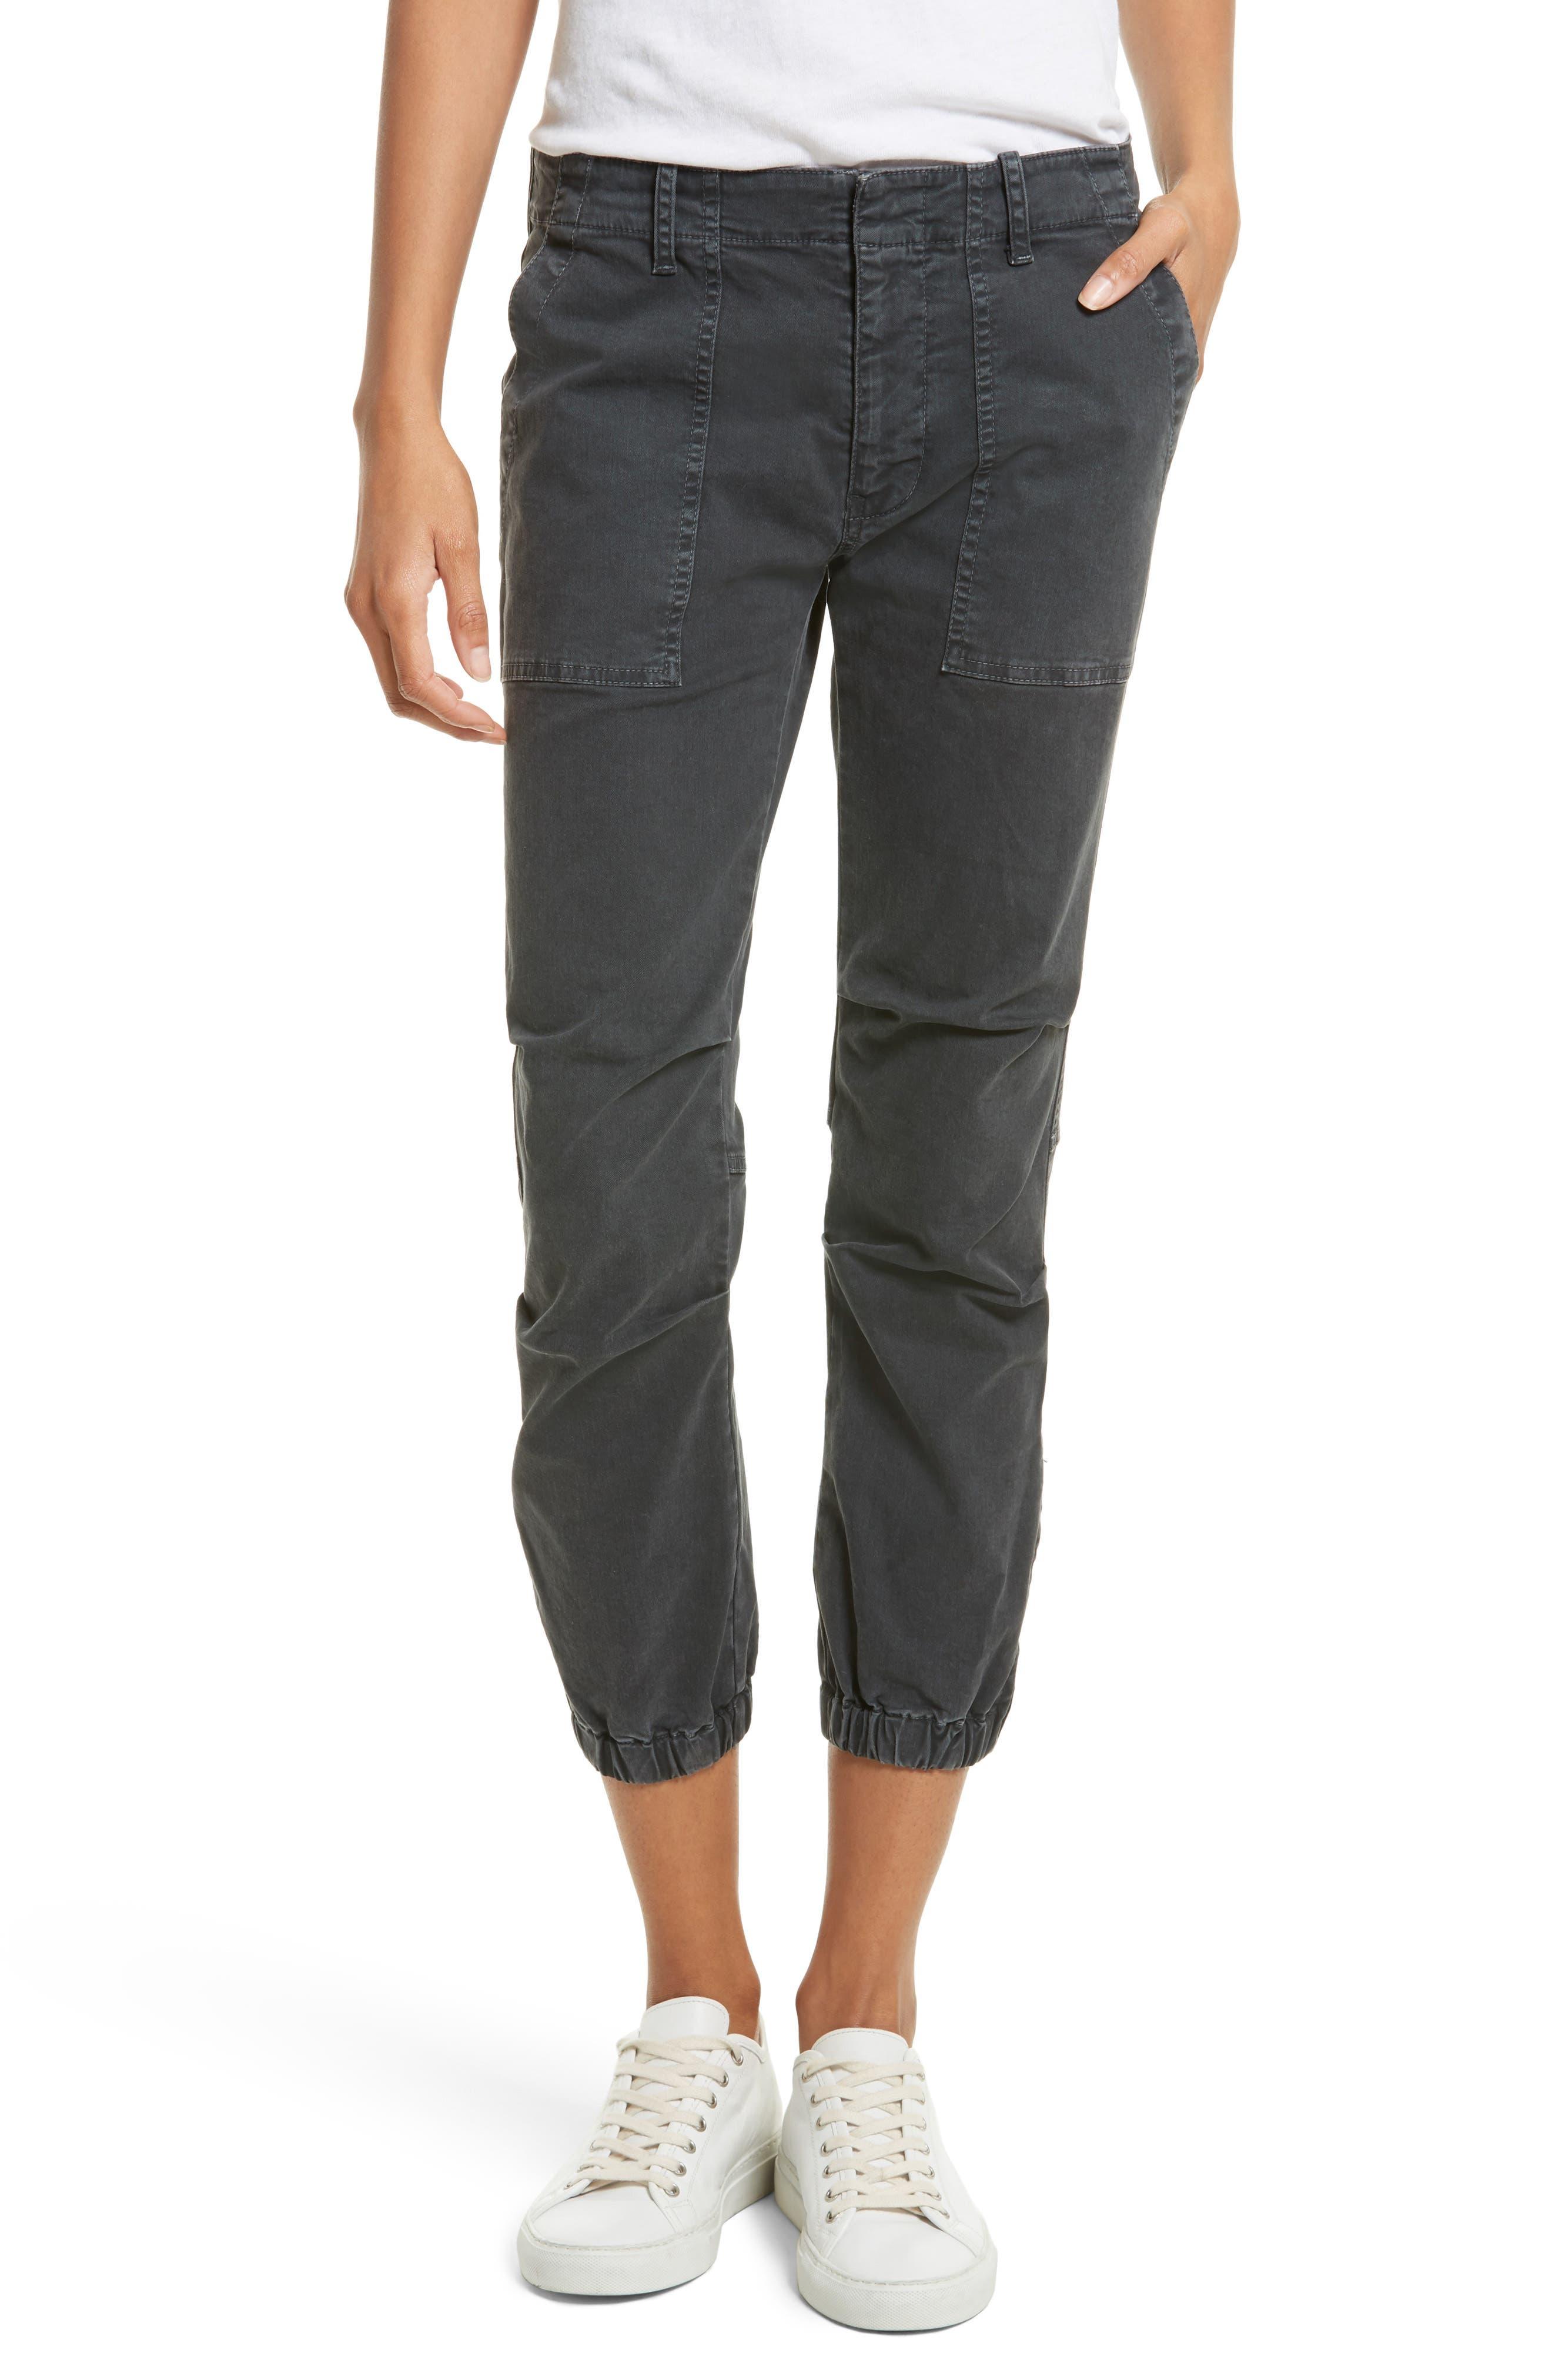 Alternate Image 1 Selected - Nili Lotan Stretch Cotton Twill Crop Military Pants